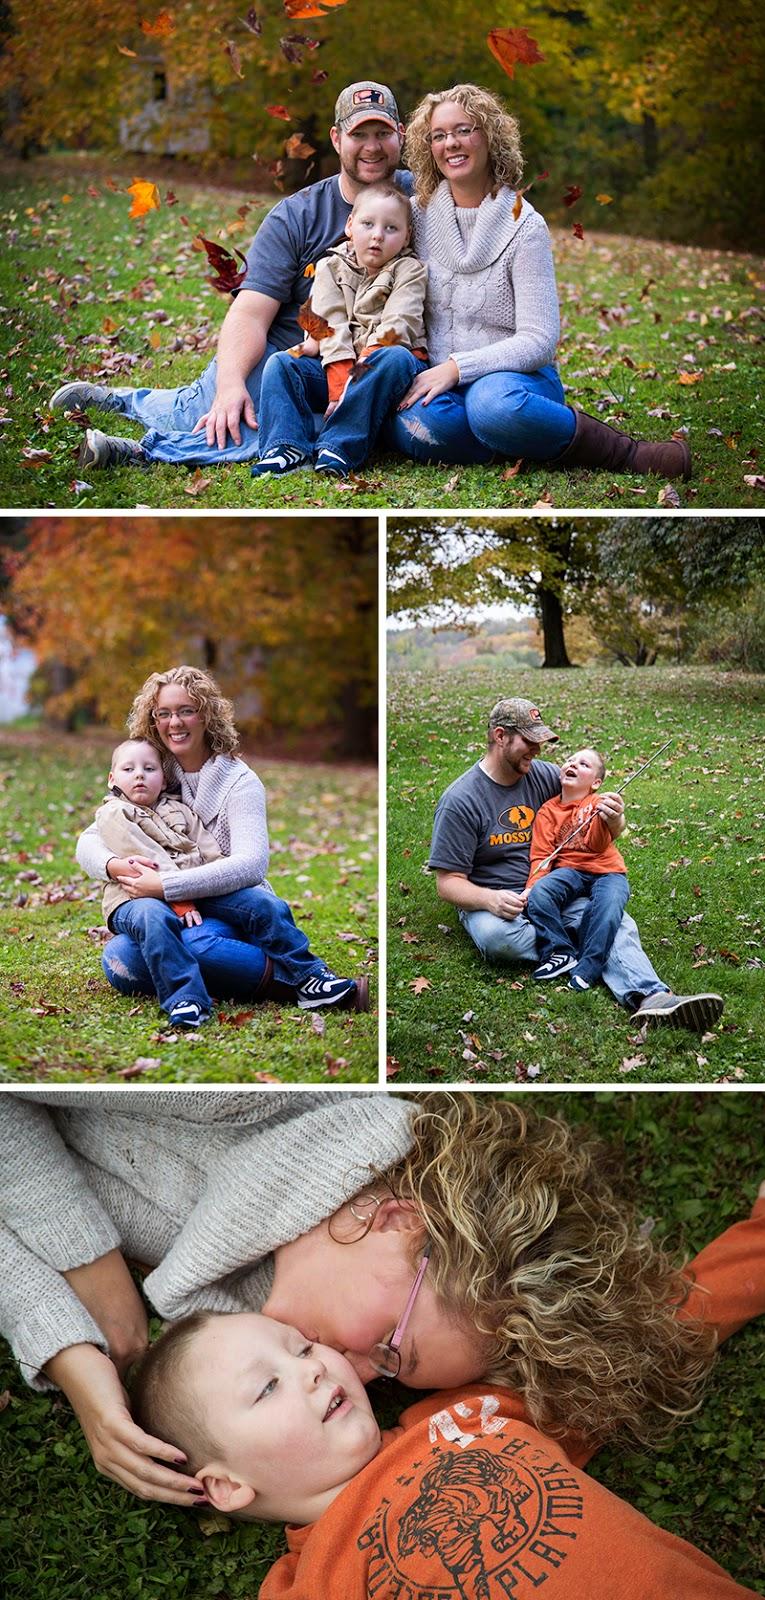 Sandra Jackson Photography, family photography, western pa photographer, foxburg photographer, parker, pa photographer,